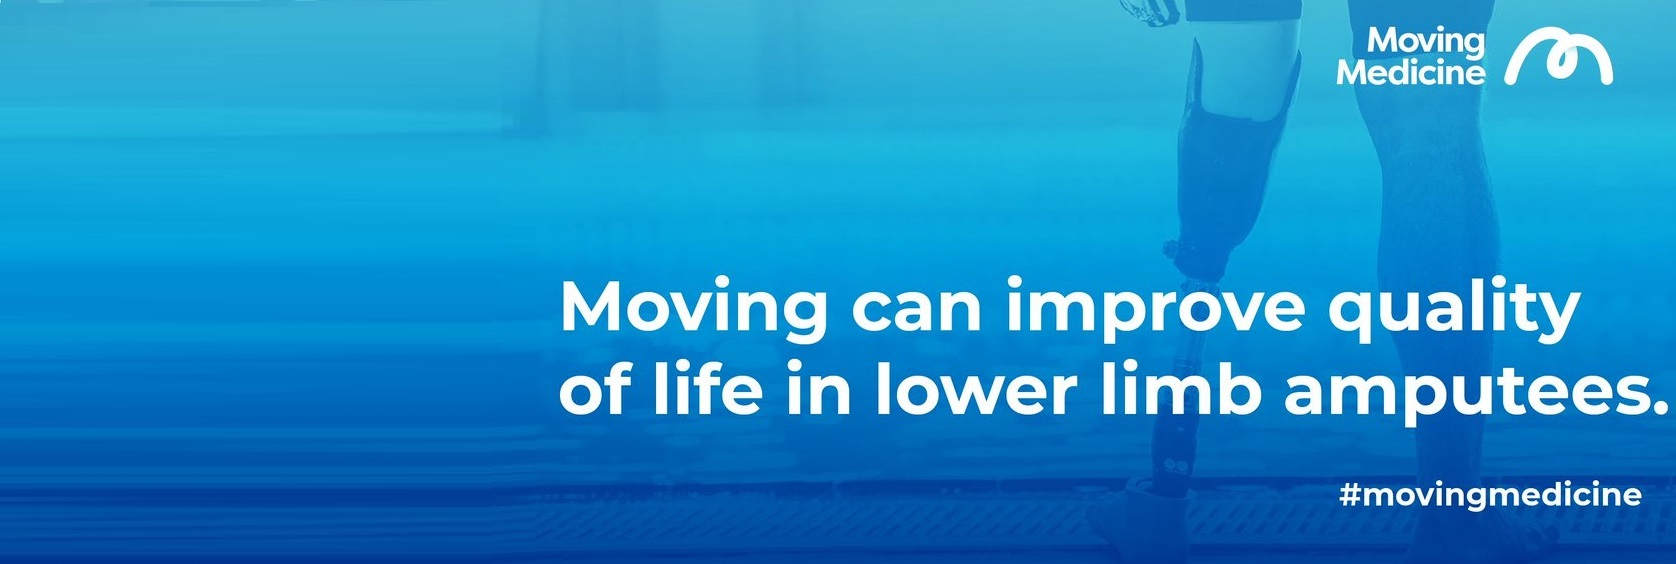 Moving Medicine